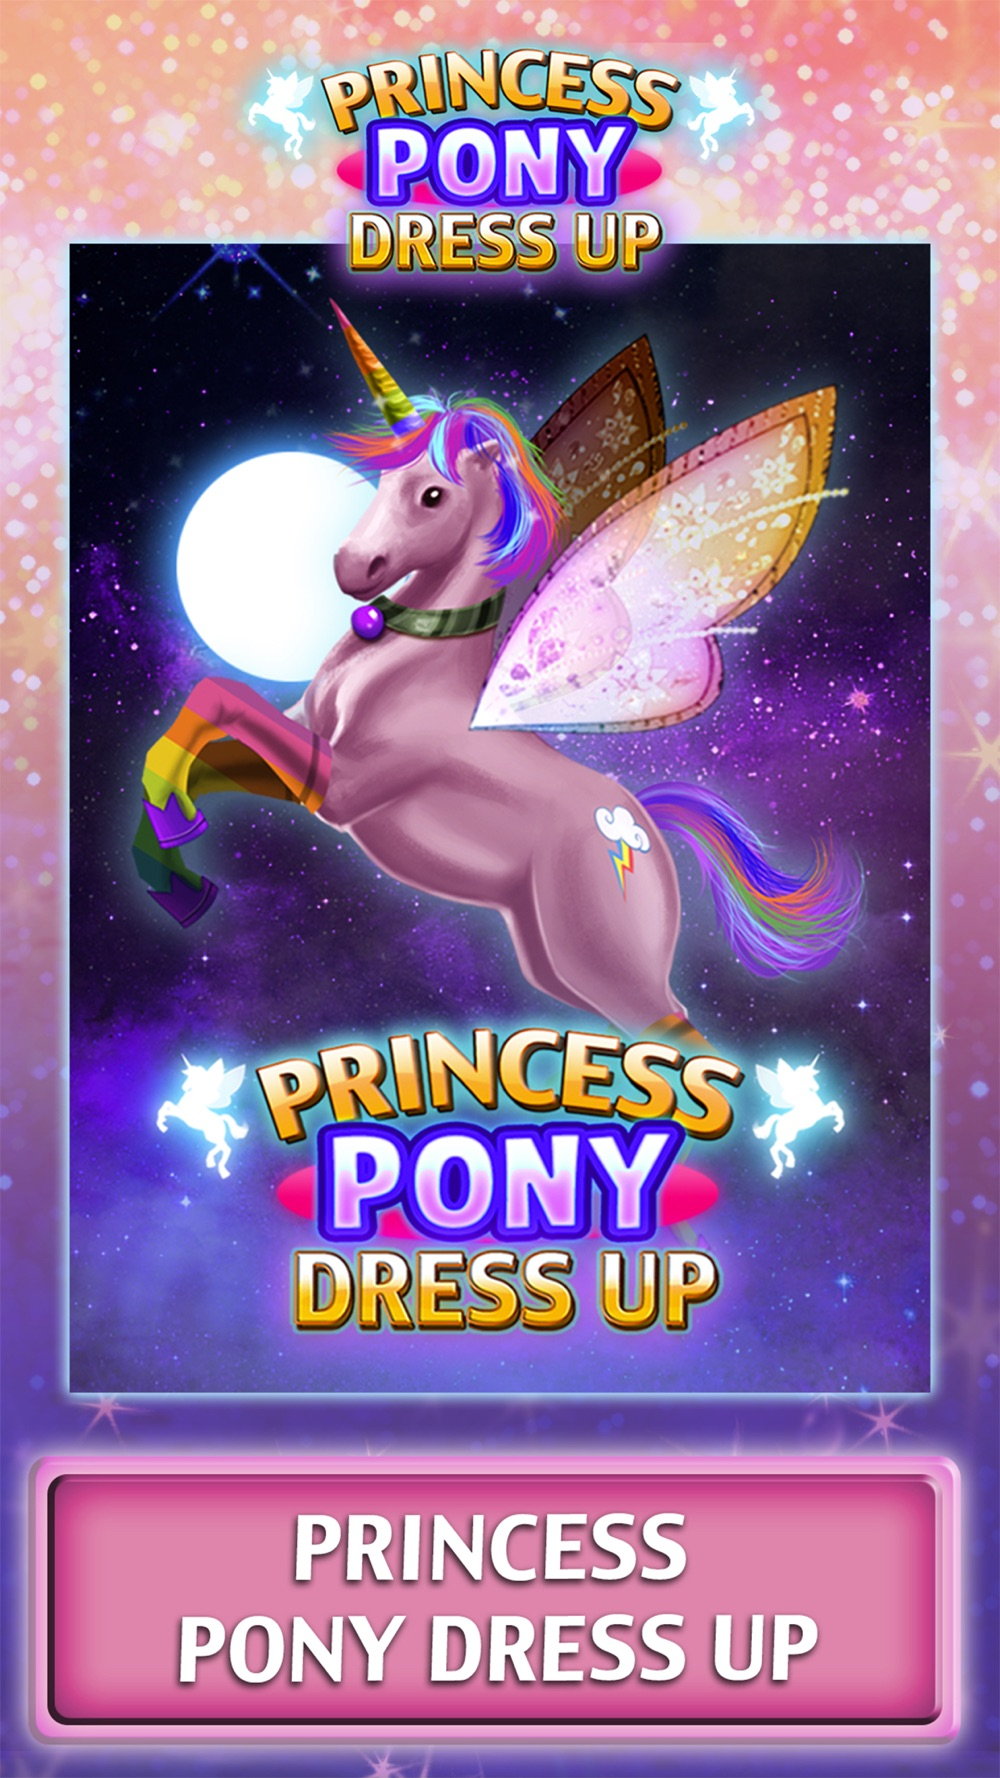 Fun Princess Pony Games – Dress Up Games for Girls